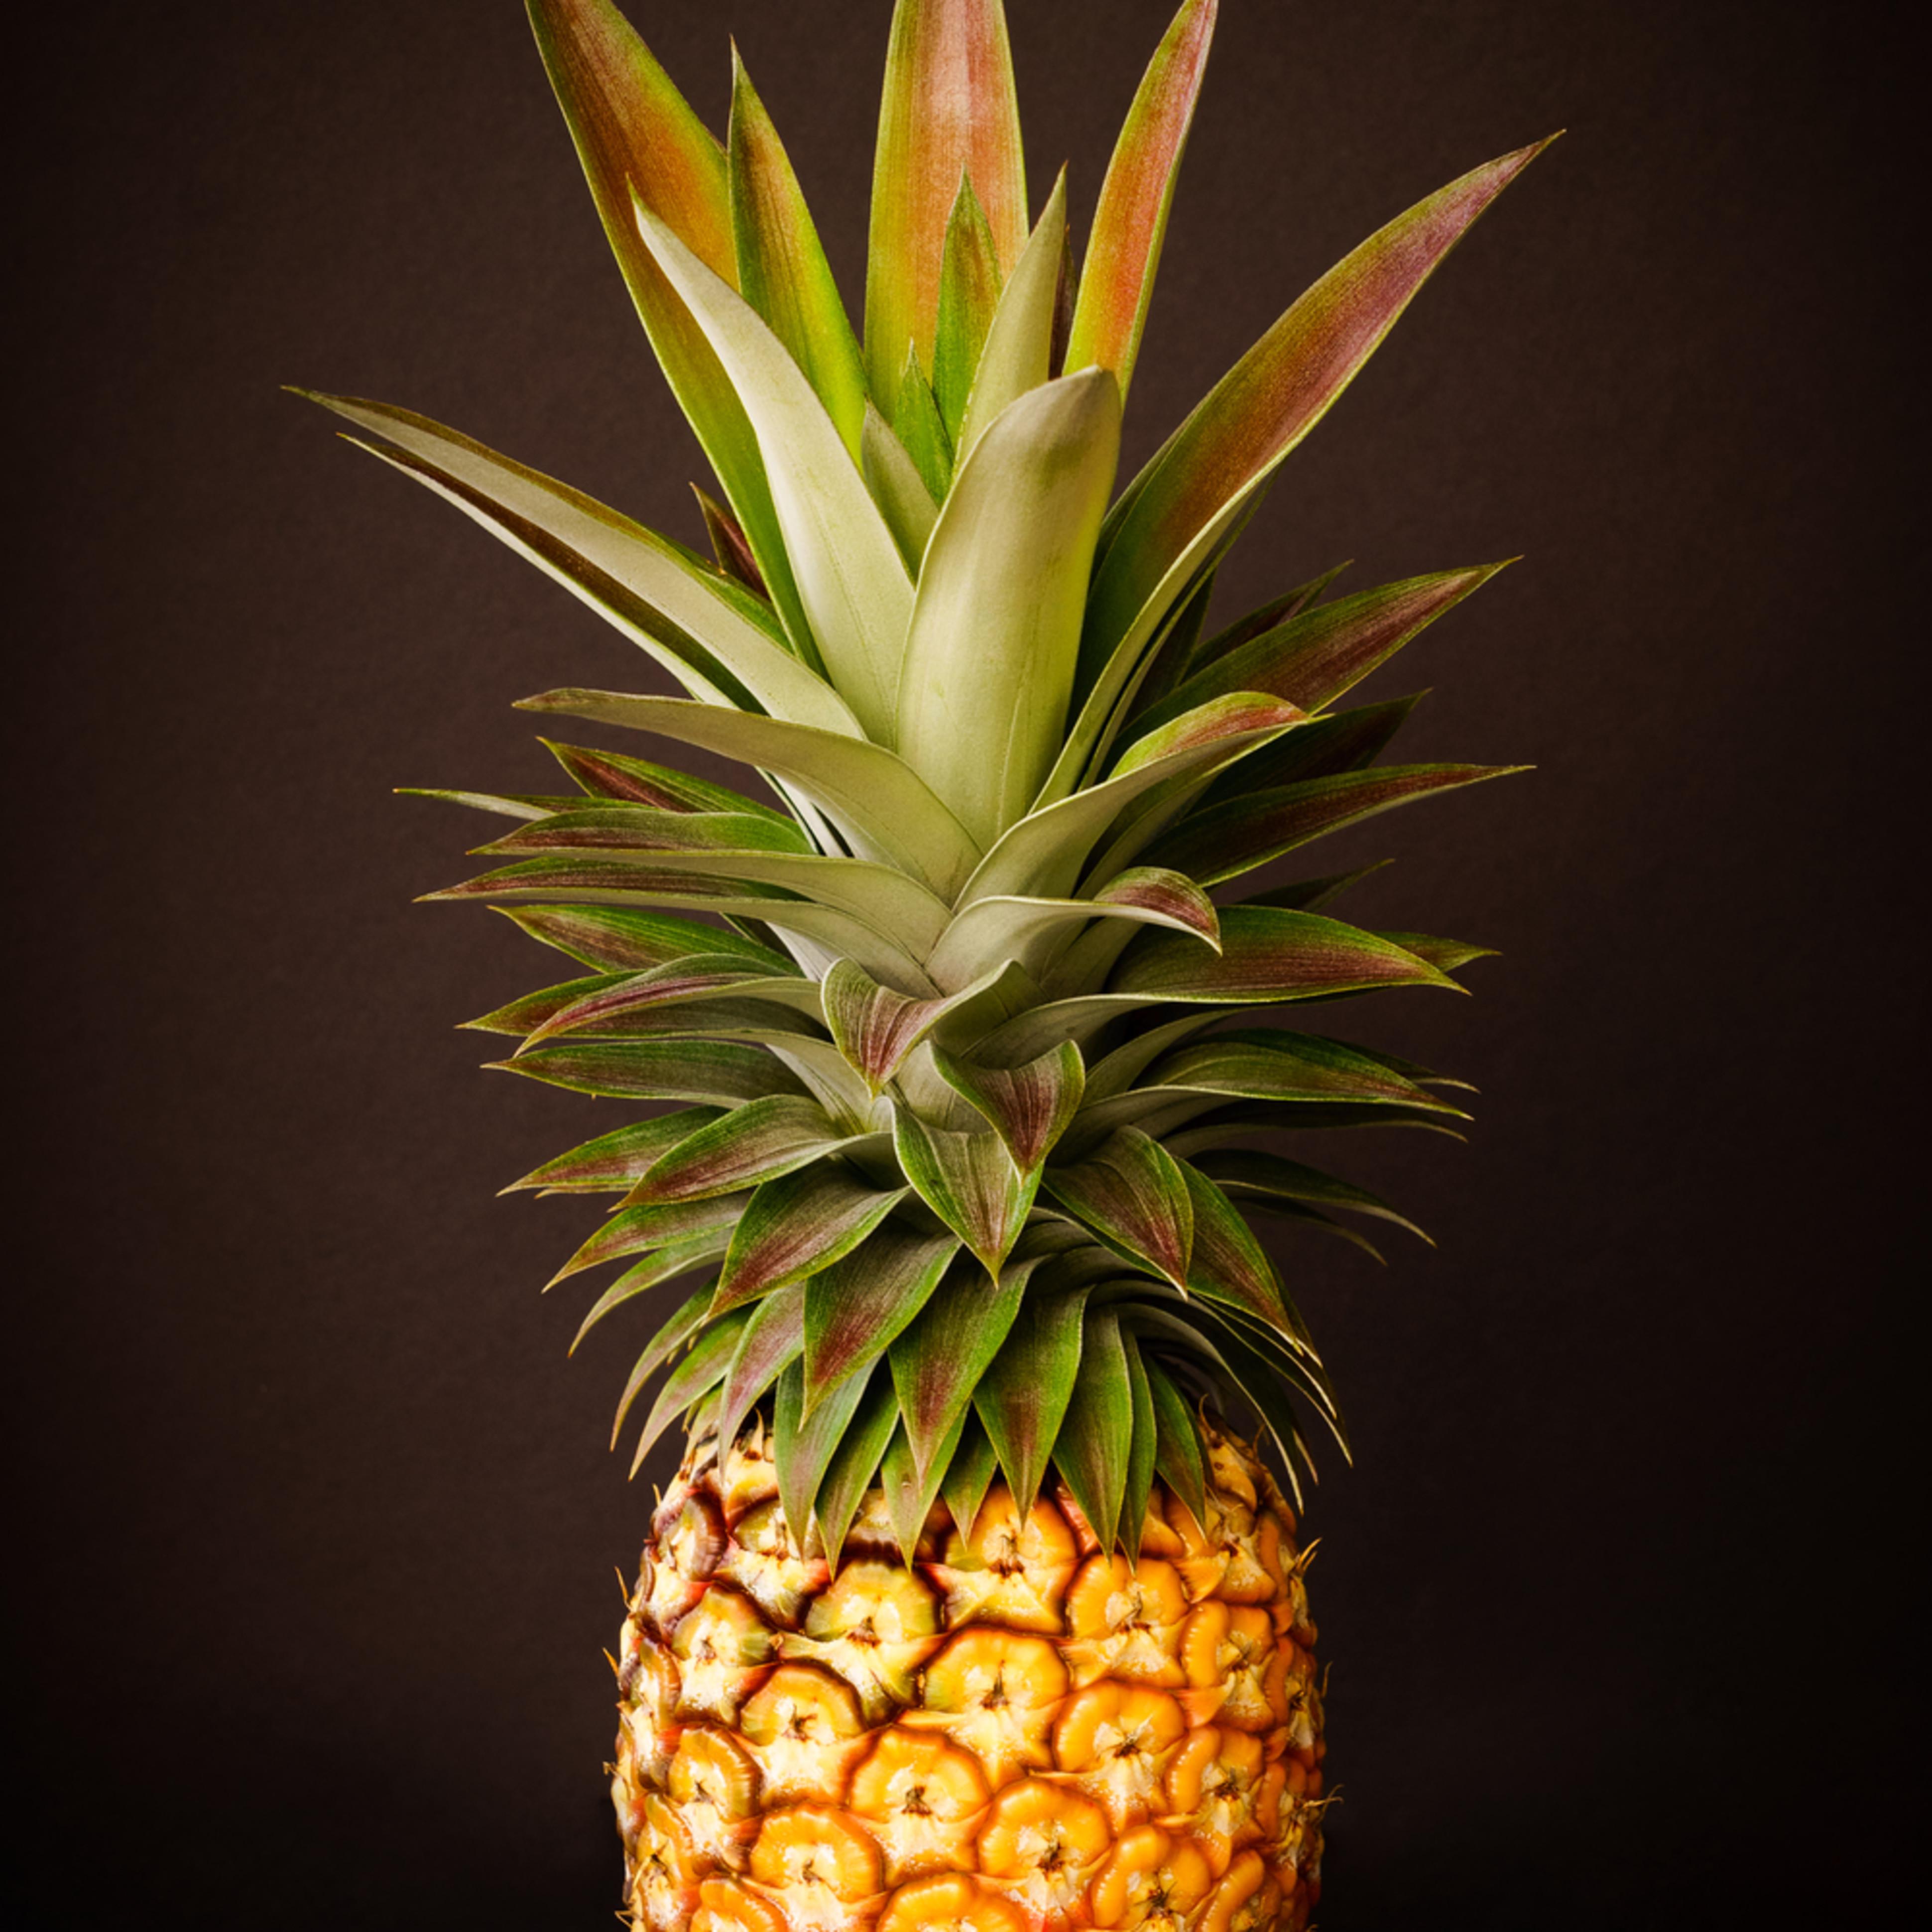 White pineapple king 2x3 wwhqiv